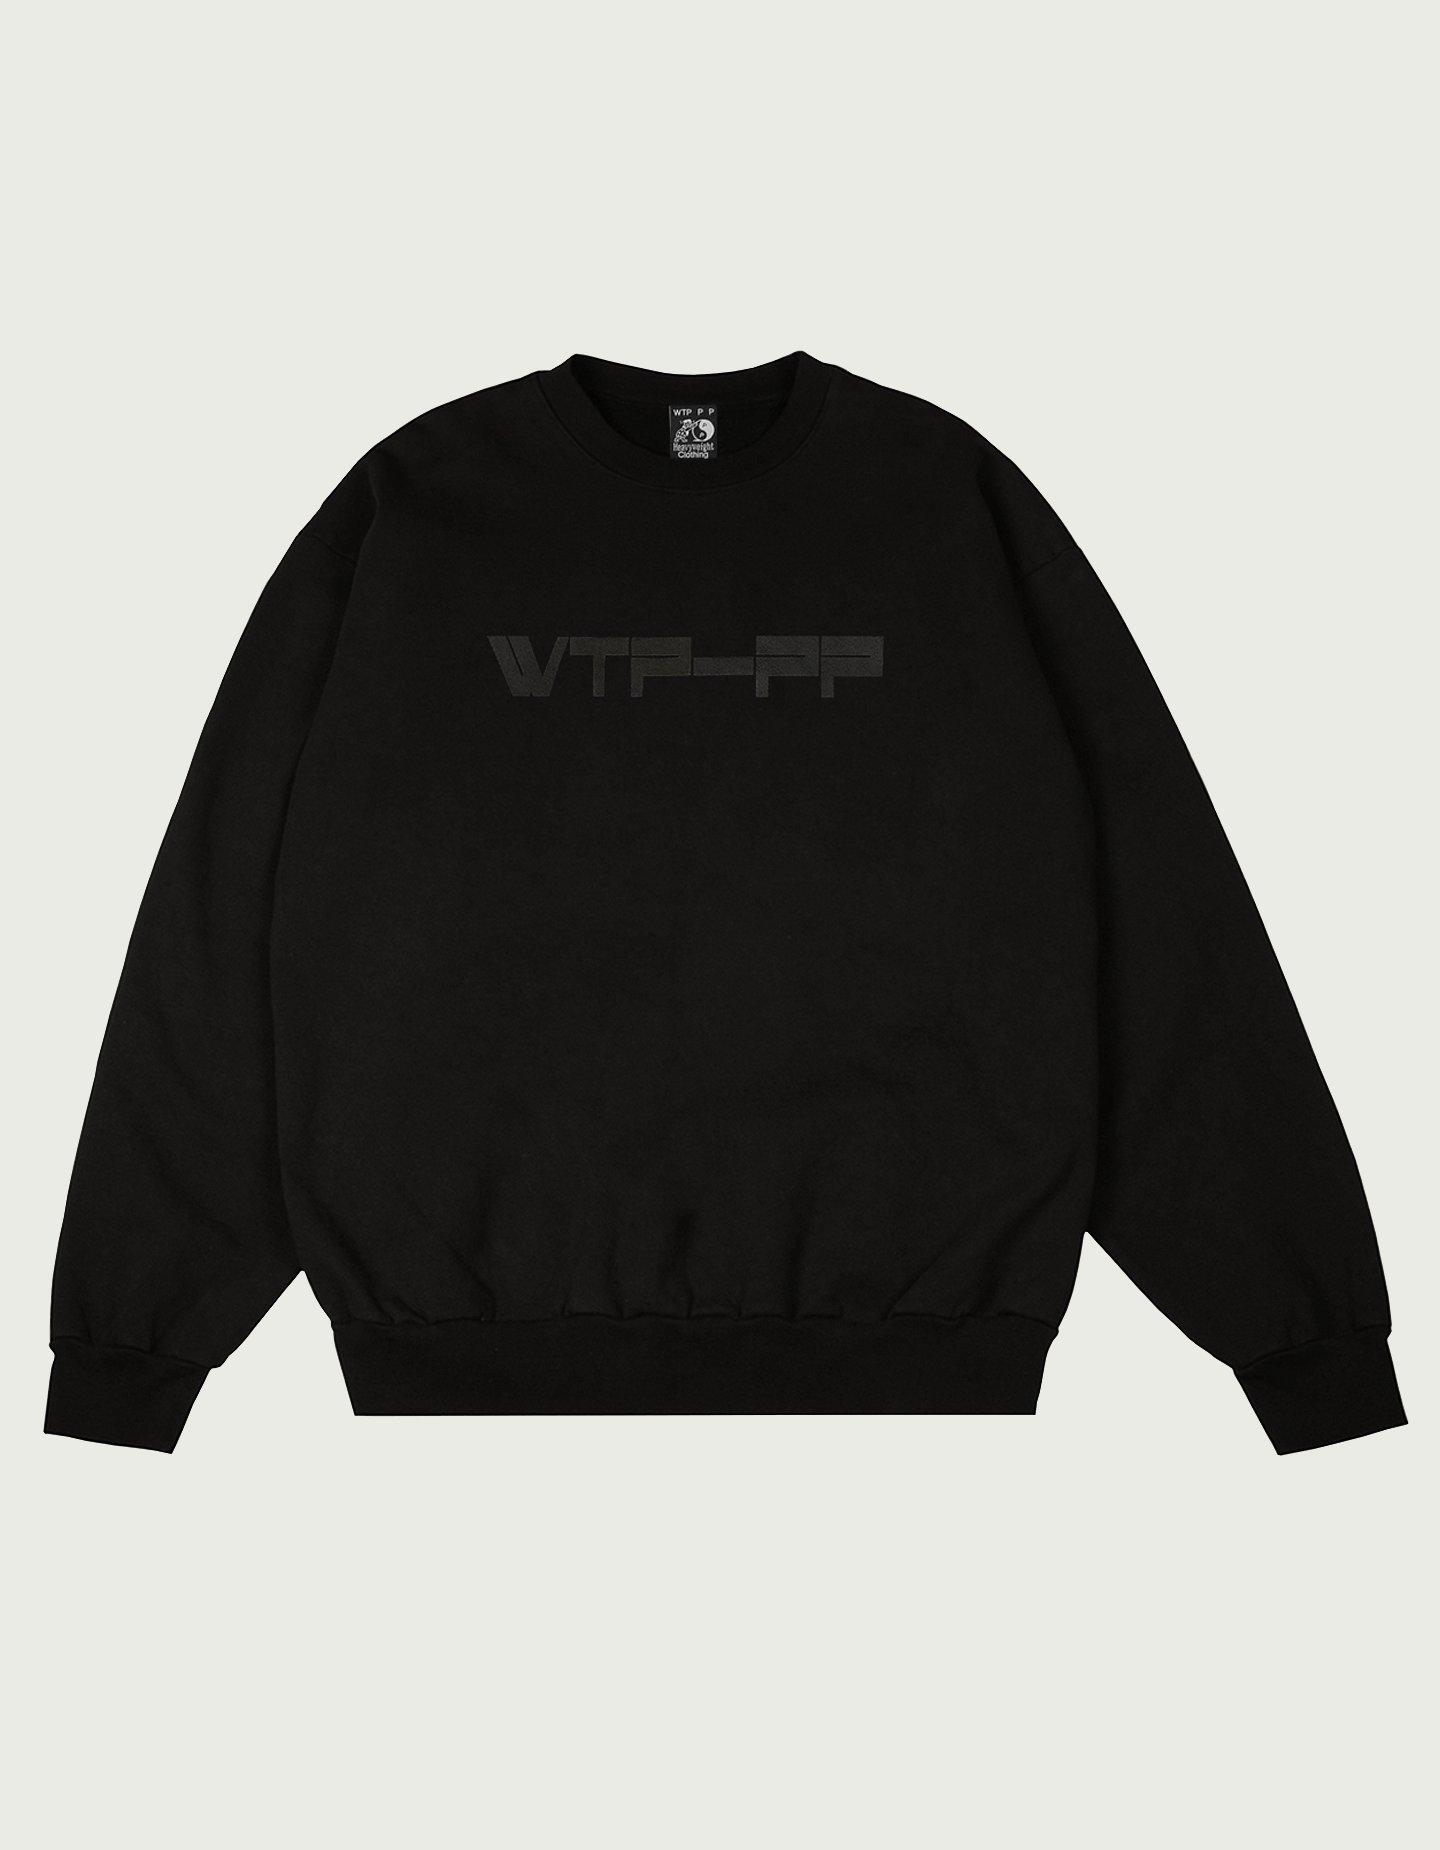 Image of Armin – Sweater (Black/Black)